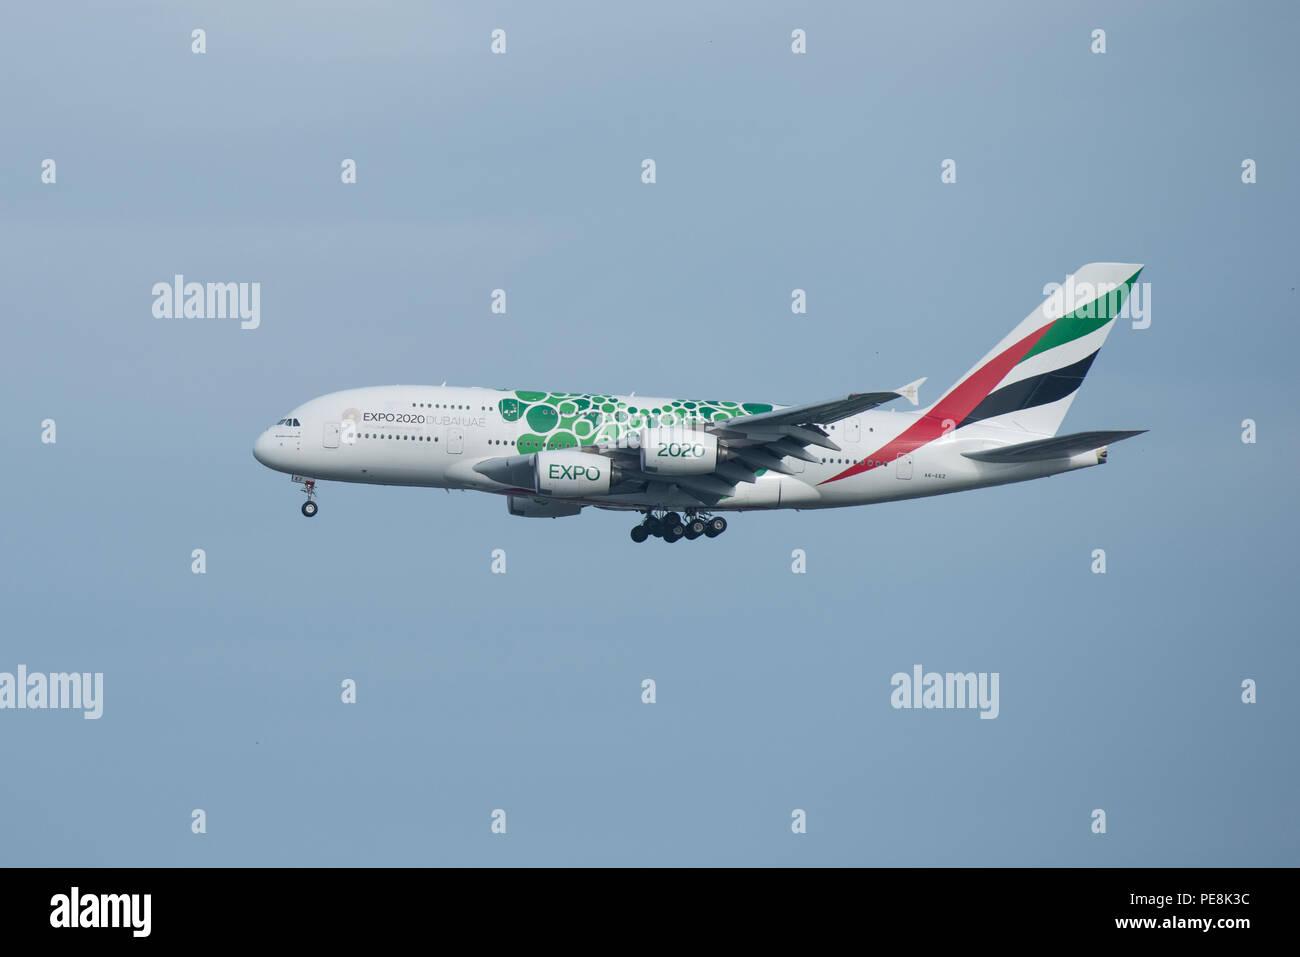 Bangkok, Thailand, 12th Aug 2018: Emirates Reg. no. A6-EEZ A380-861 Flight EK374 from DXB landing to BKK - Stock Image